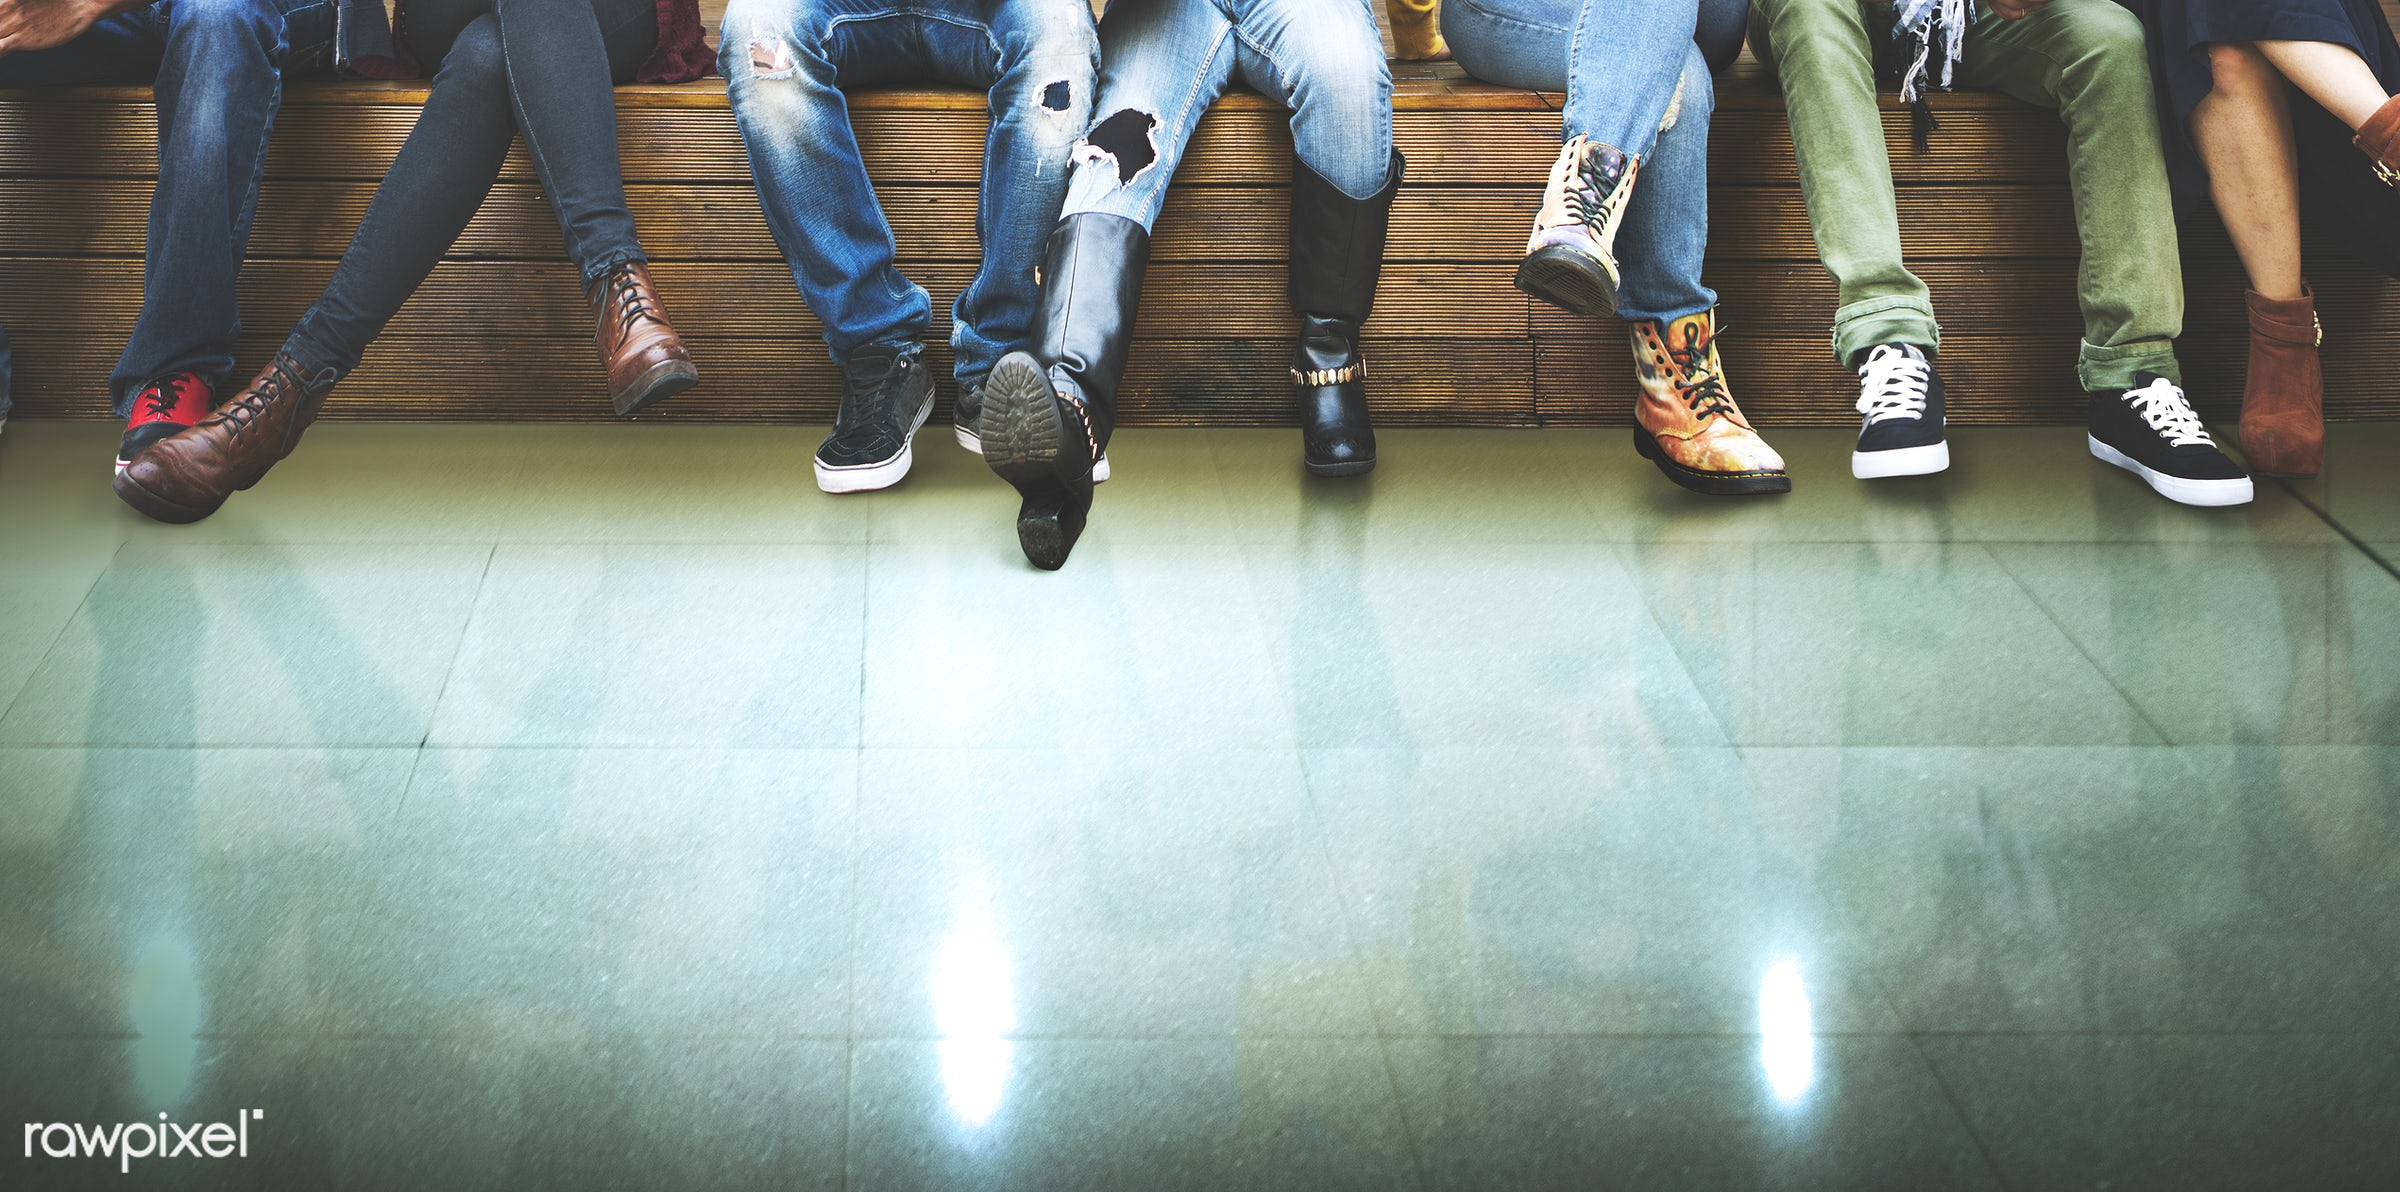 copy space, diverse, feet, team, together, green floor, design space, friends, sitting, floor, legs, group, closeup